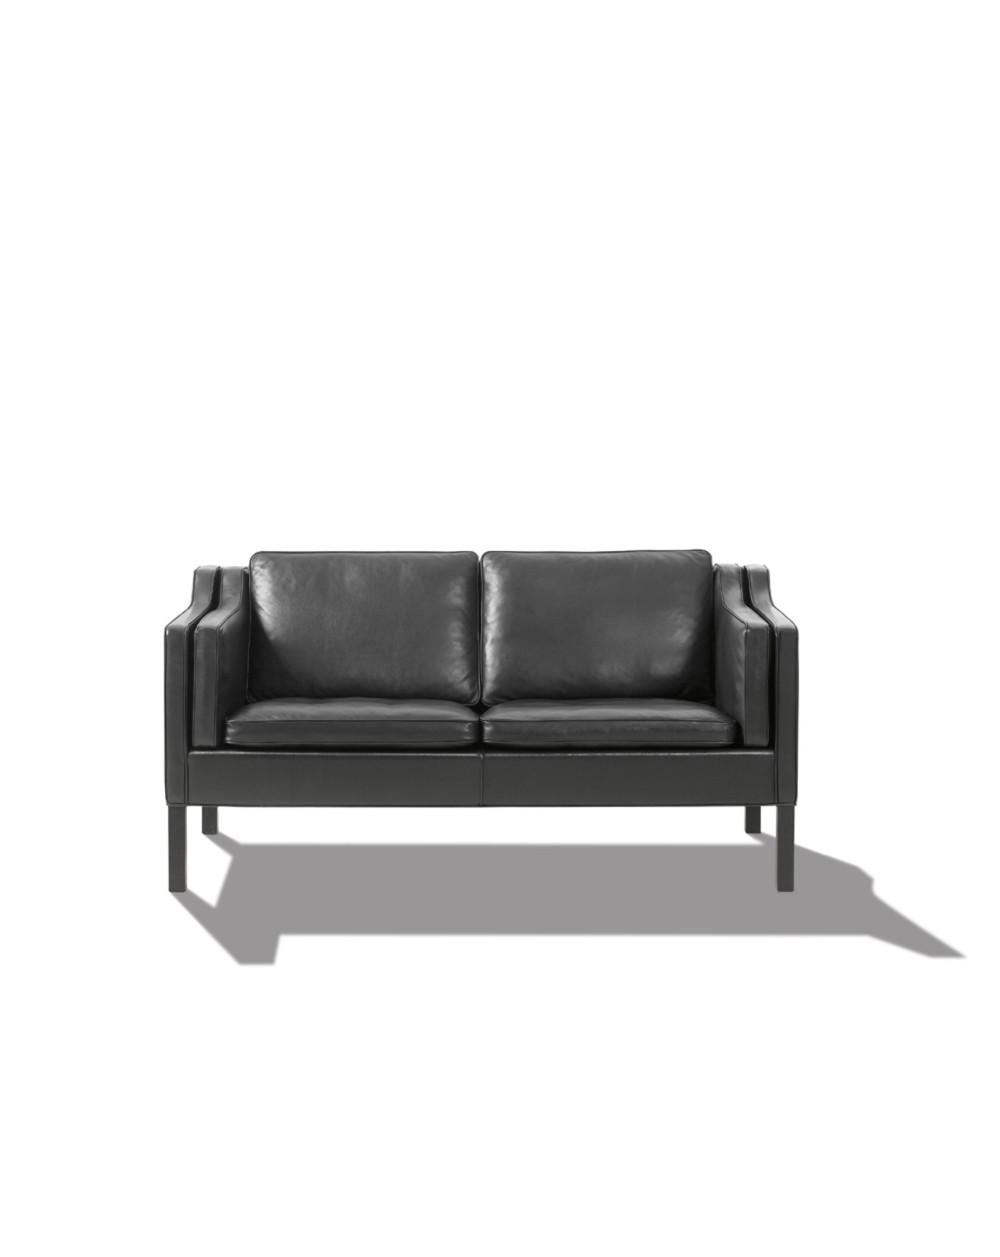 Classic sofa, Borge Mogensen